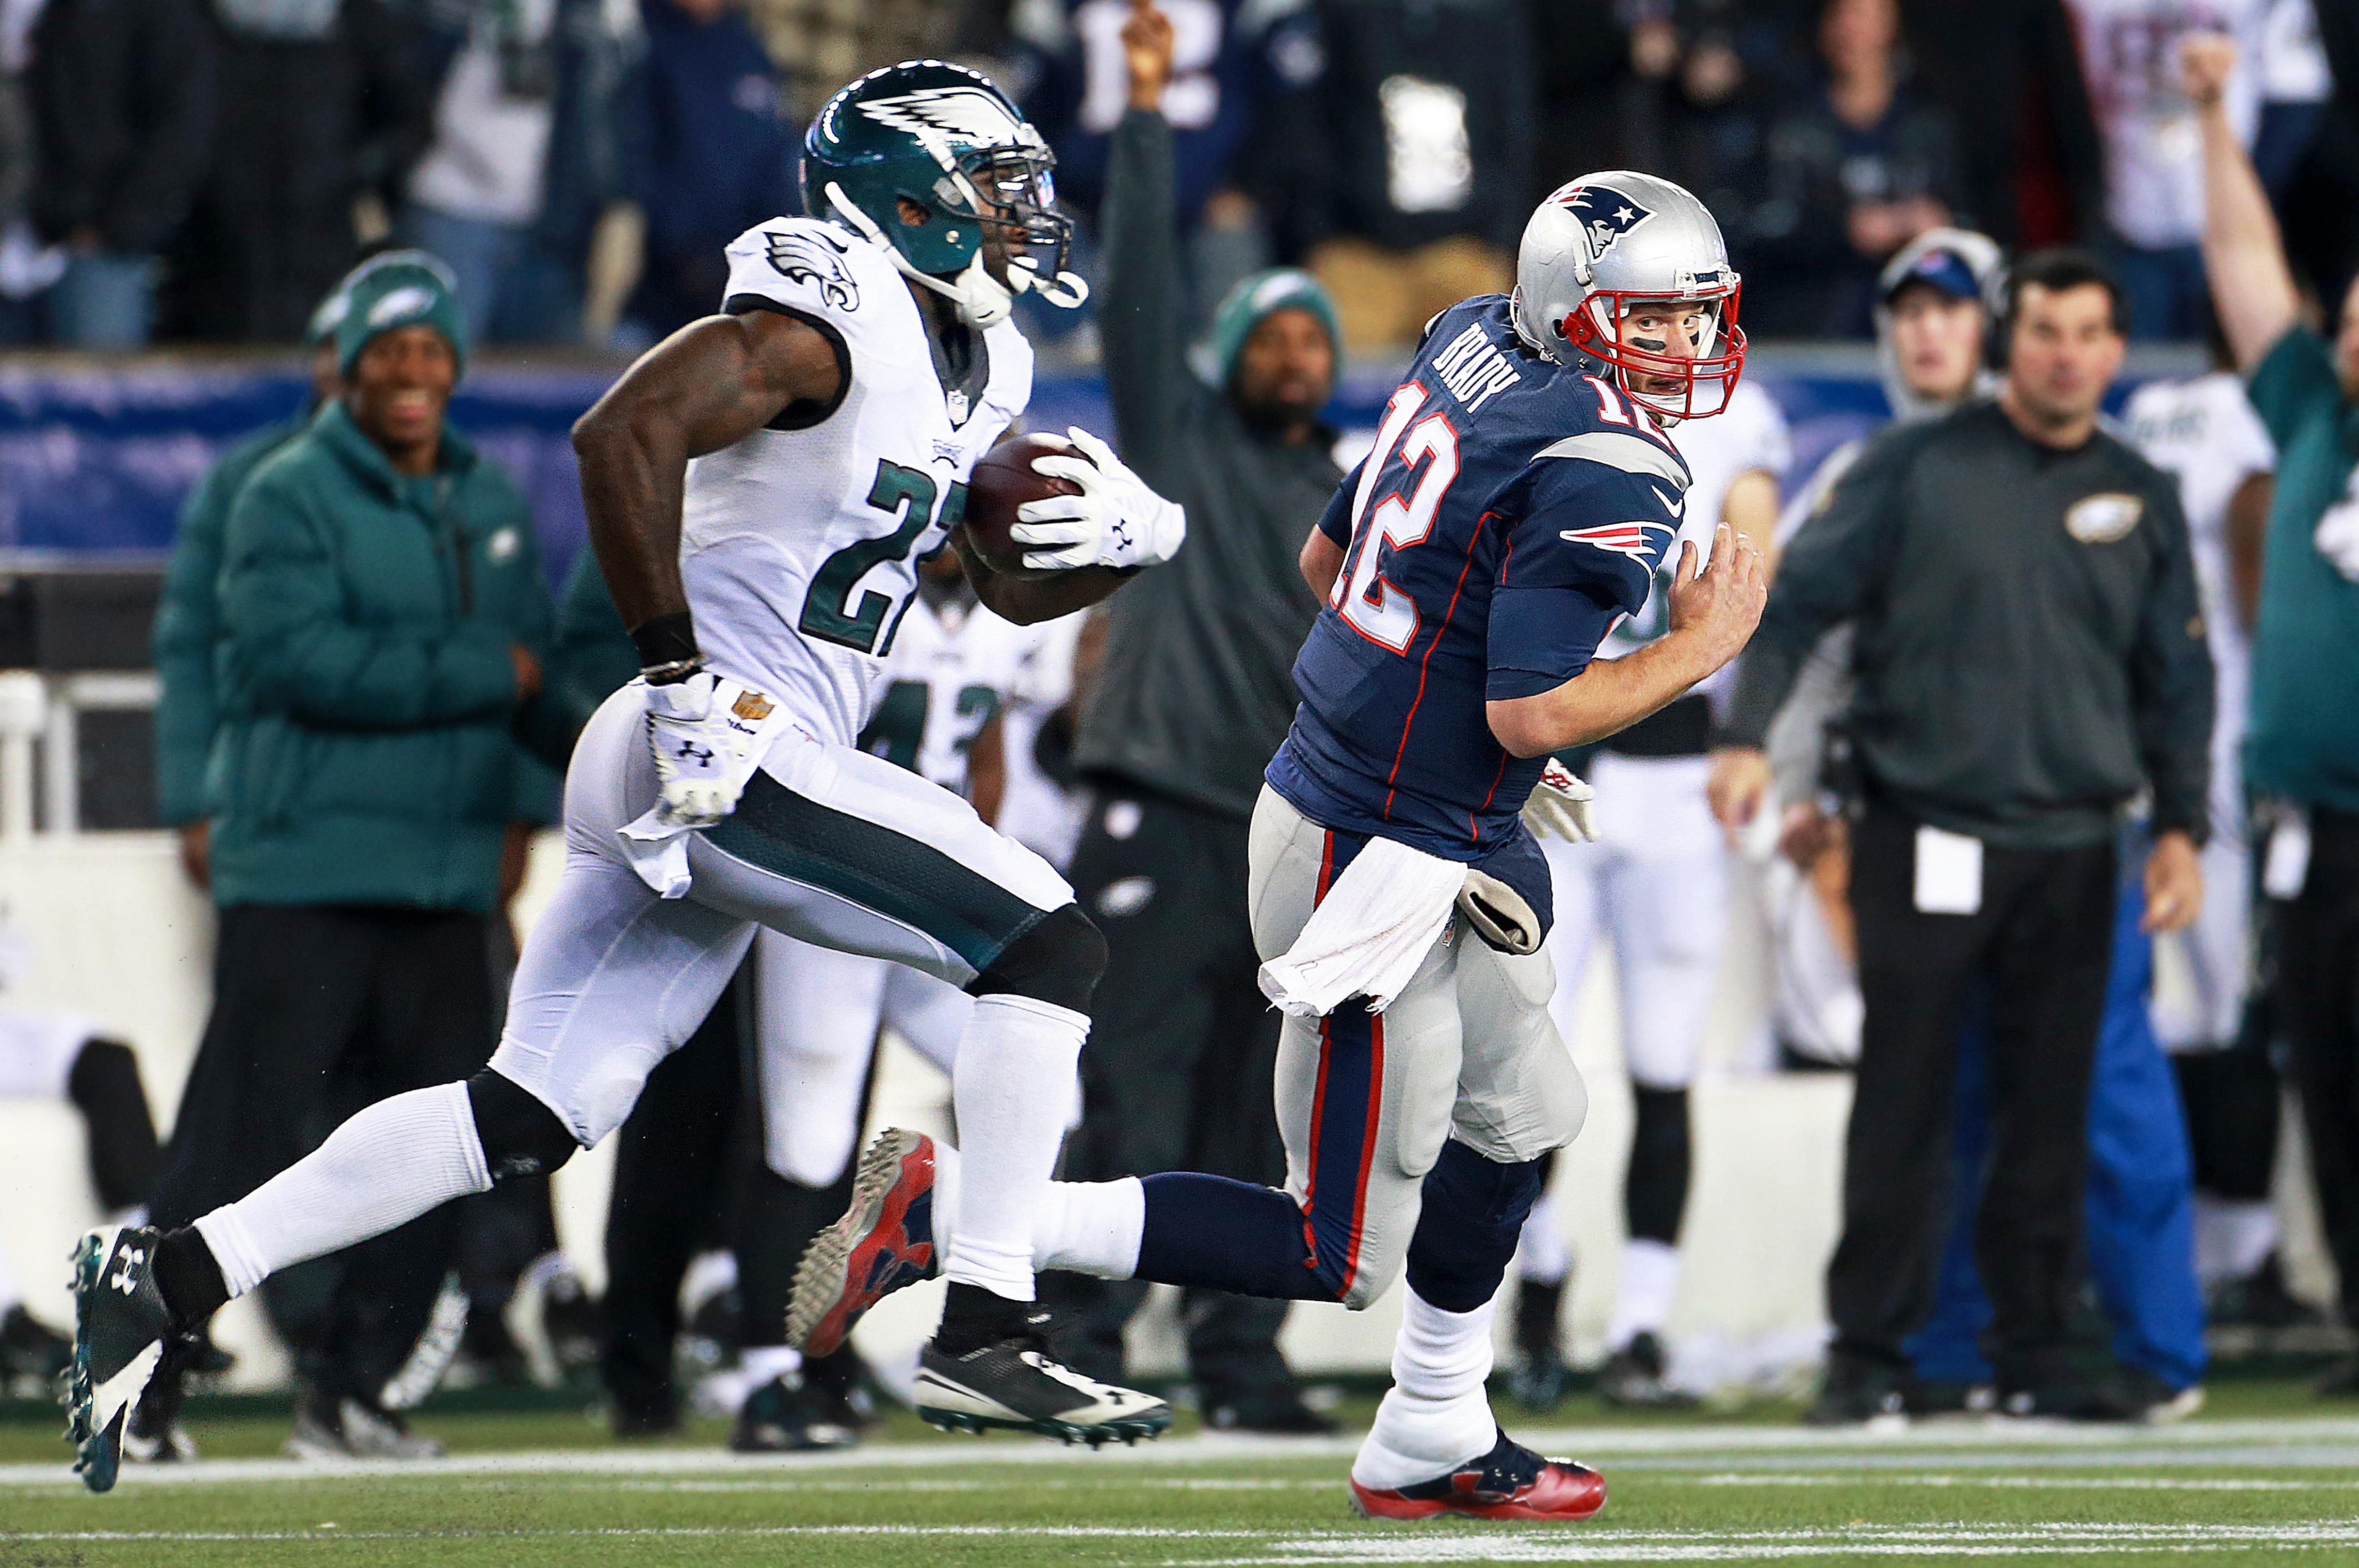 Philadelphia Eagles Vs. New England Patriots At Gillette Stadium